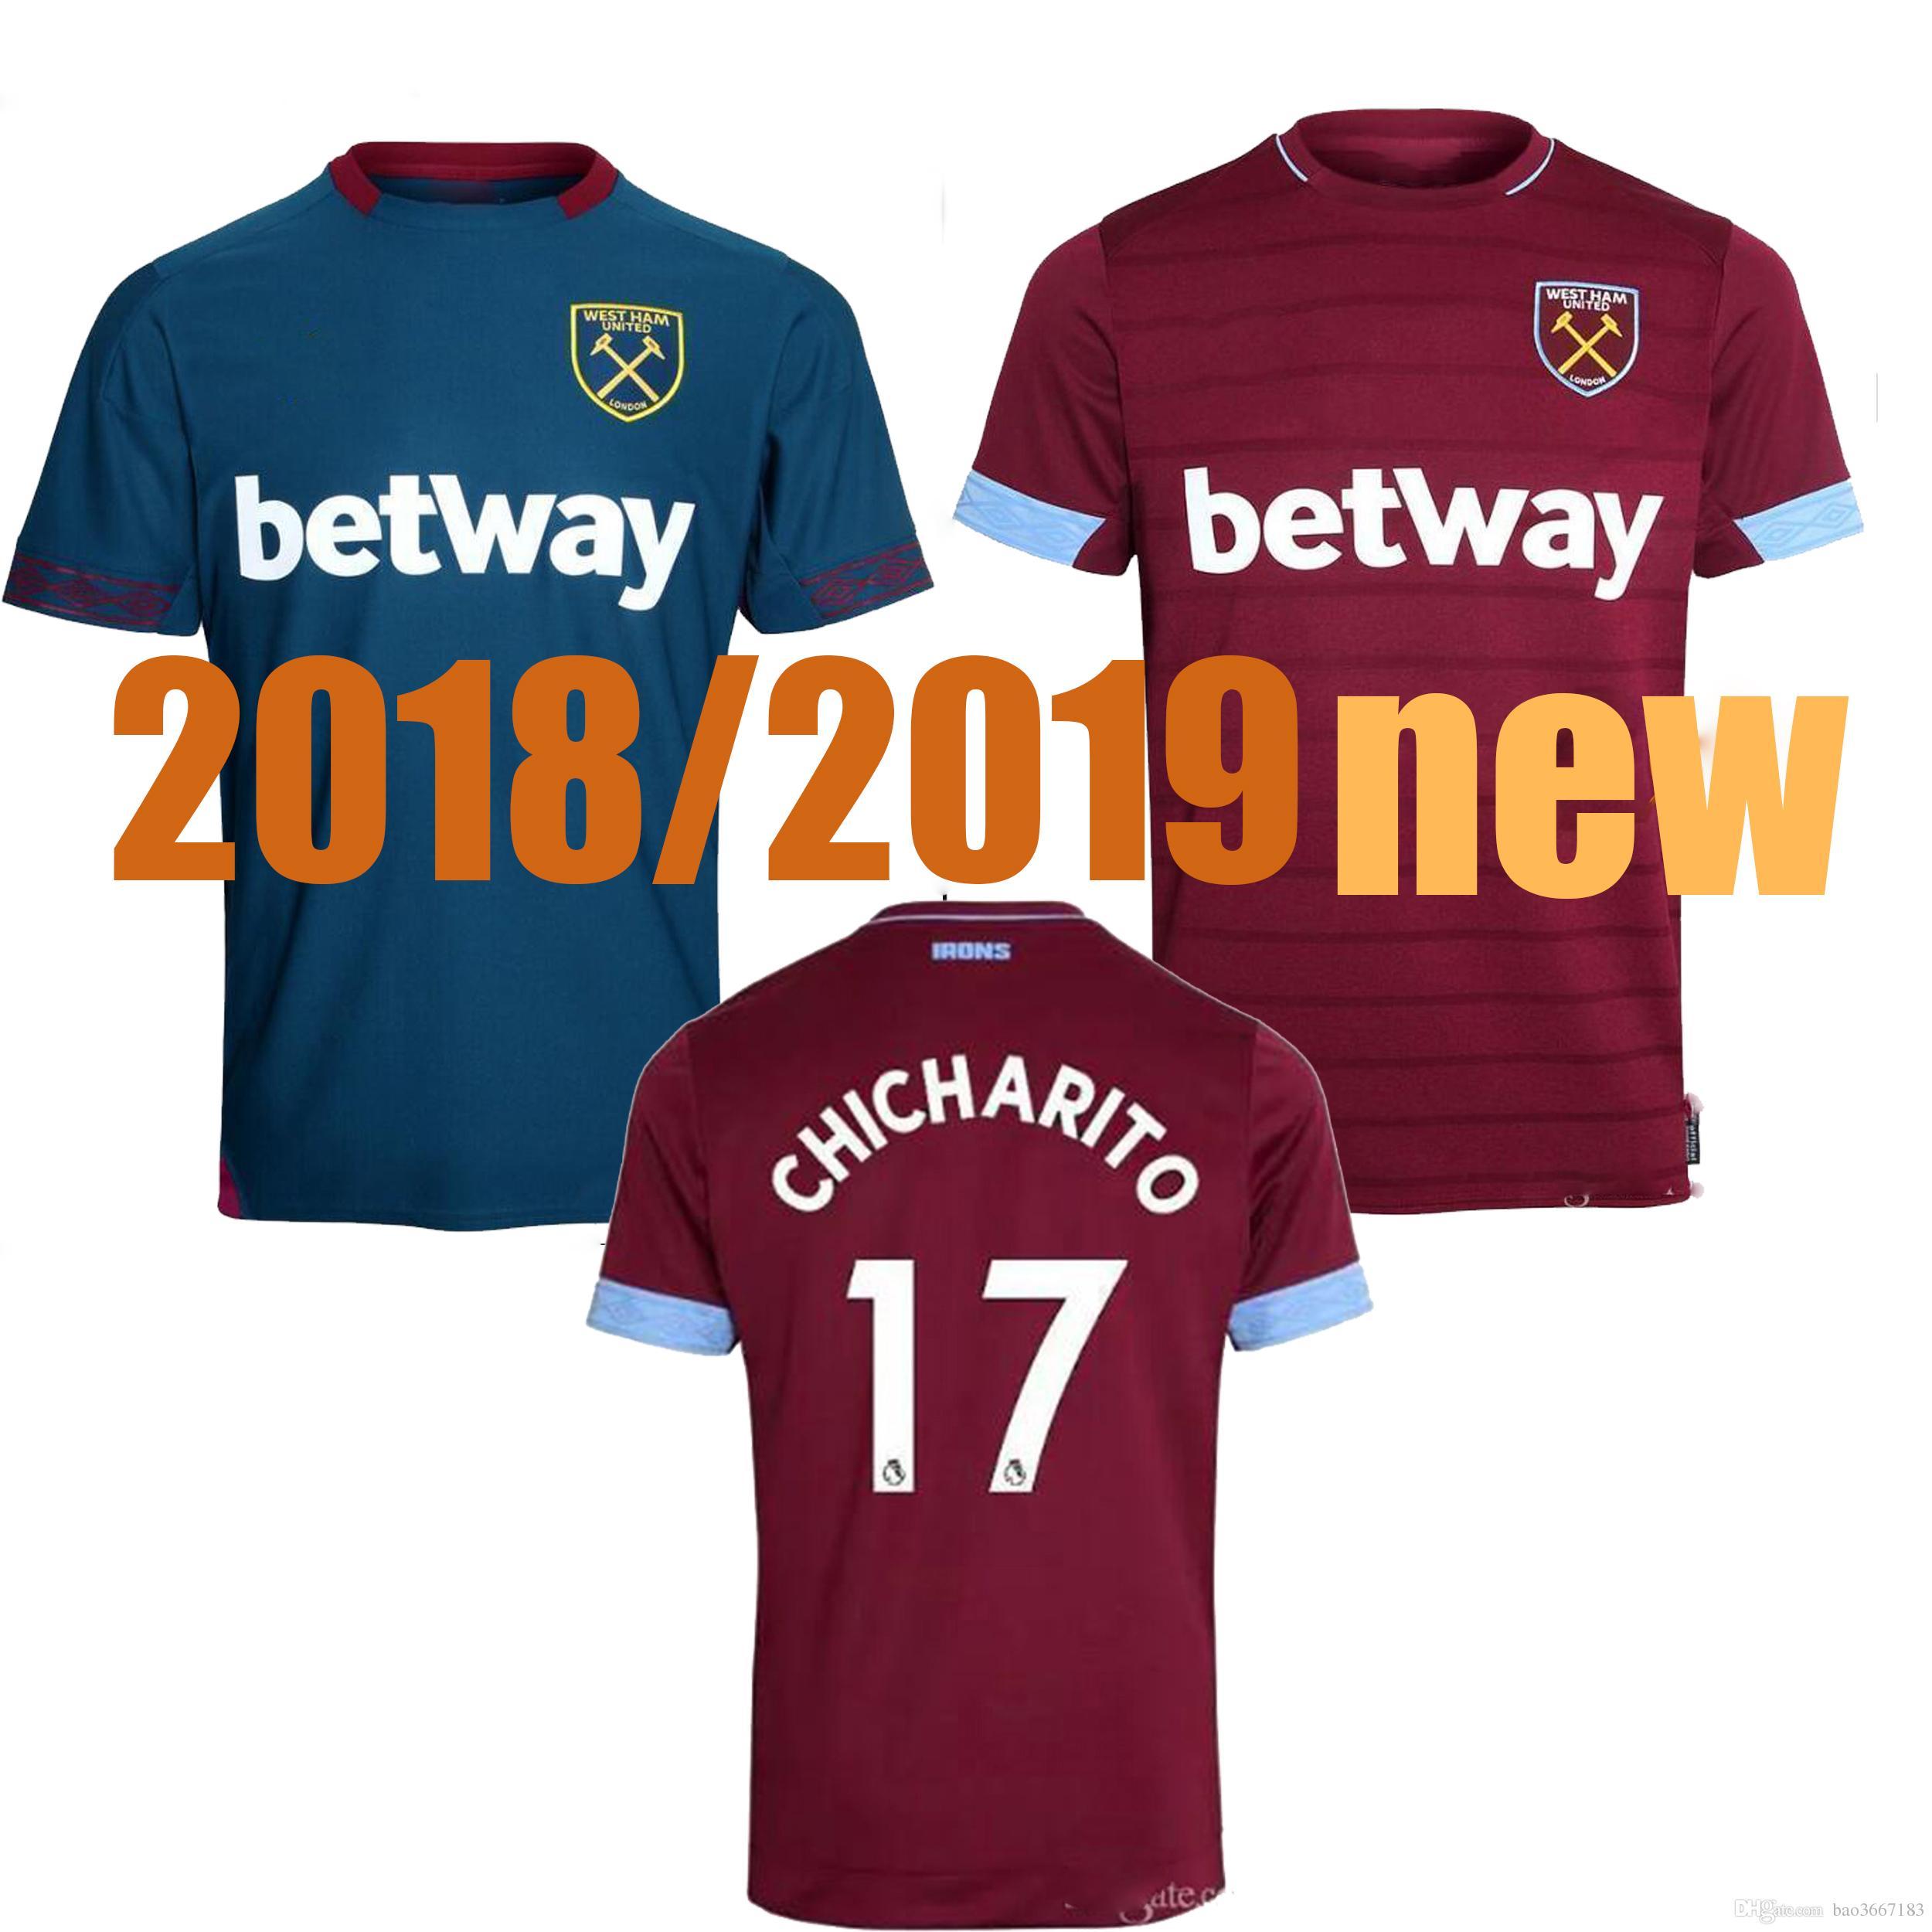 2019 SIZE S XXL 2018 2019 West Ham United Soccer Jerseys LANZINI ANTONIO  CARROLL CHICHARITO 2018 2019 West Ham United Football Shirts From  Bao3667183 2aaa3d061